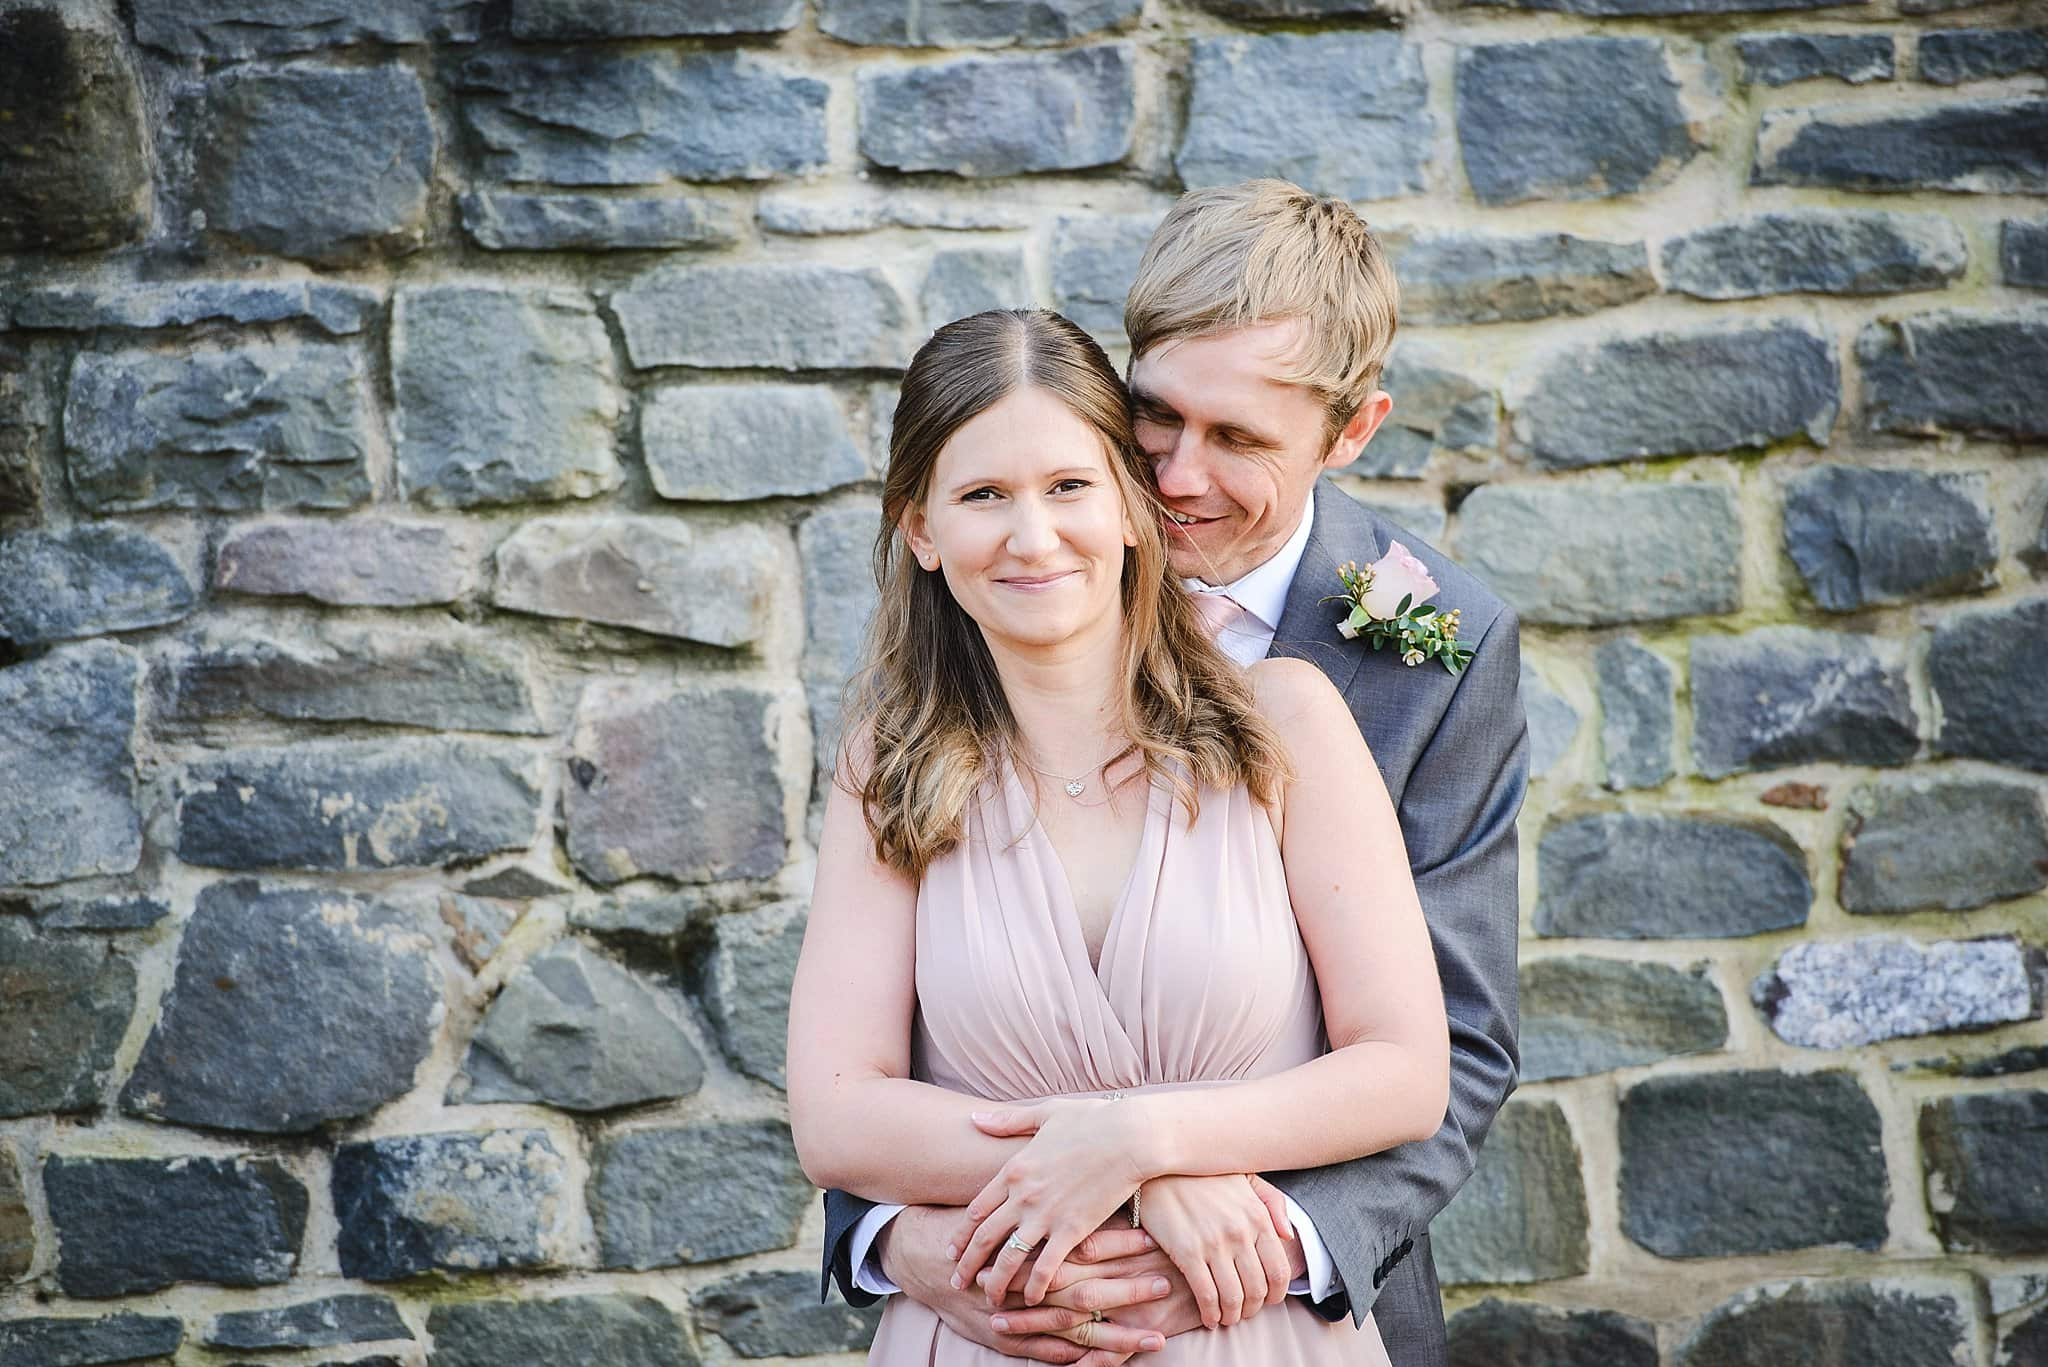 Bride & groom intimate wedding photo